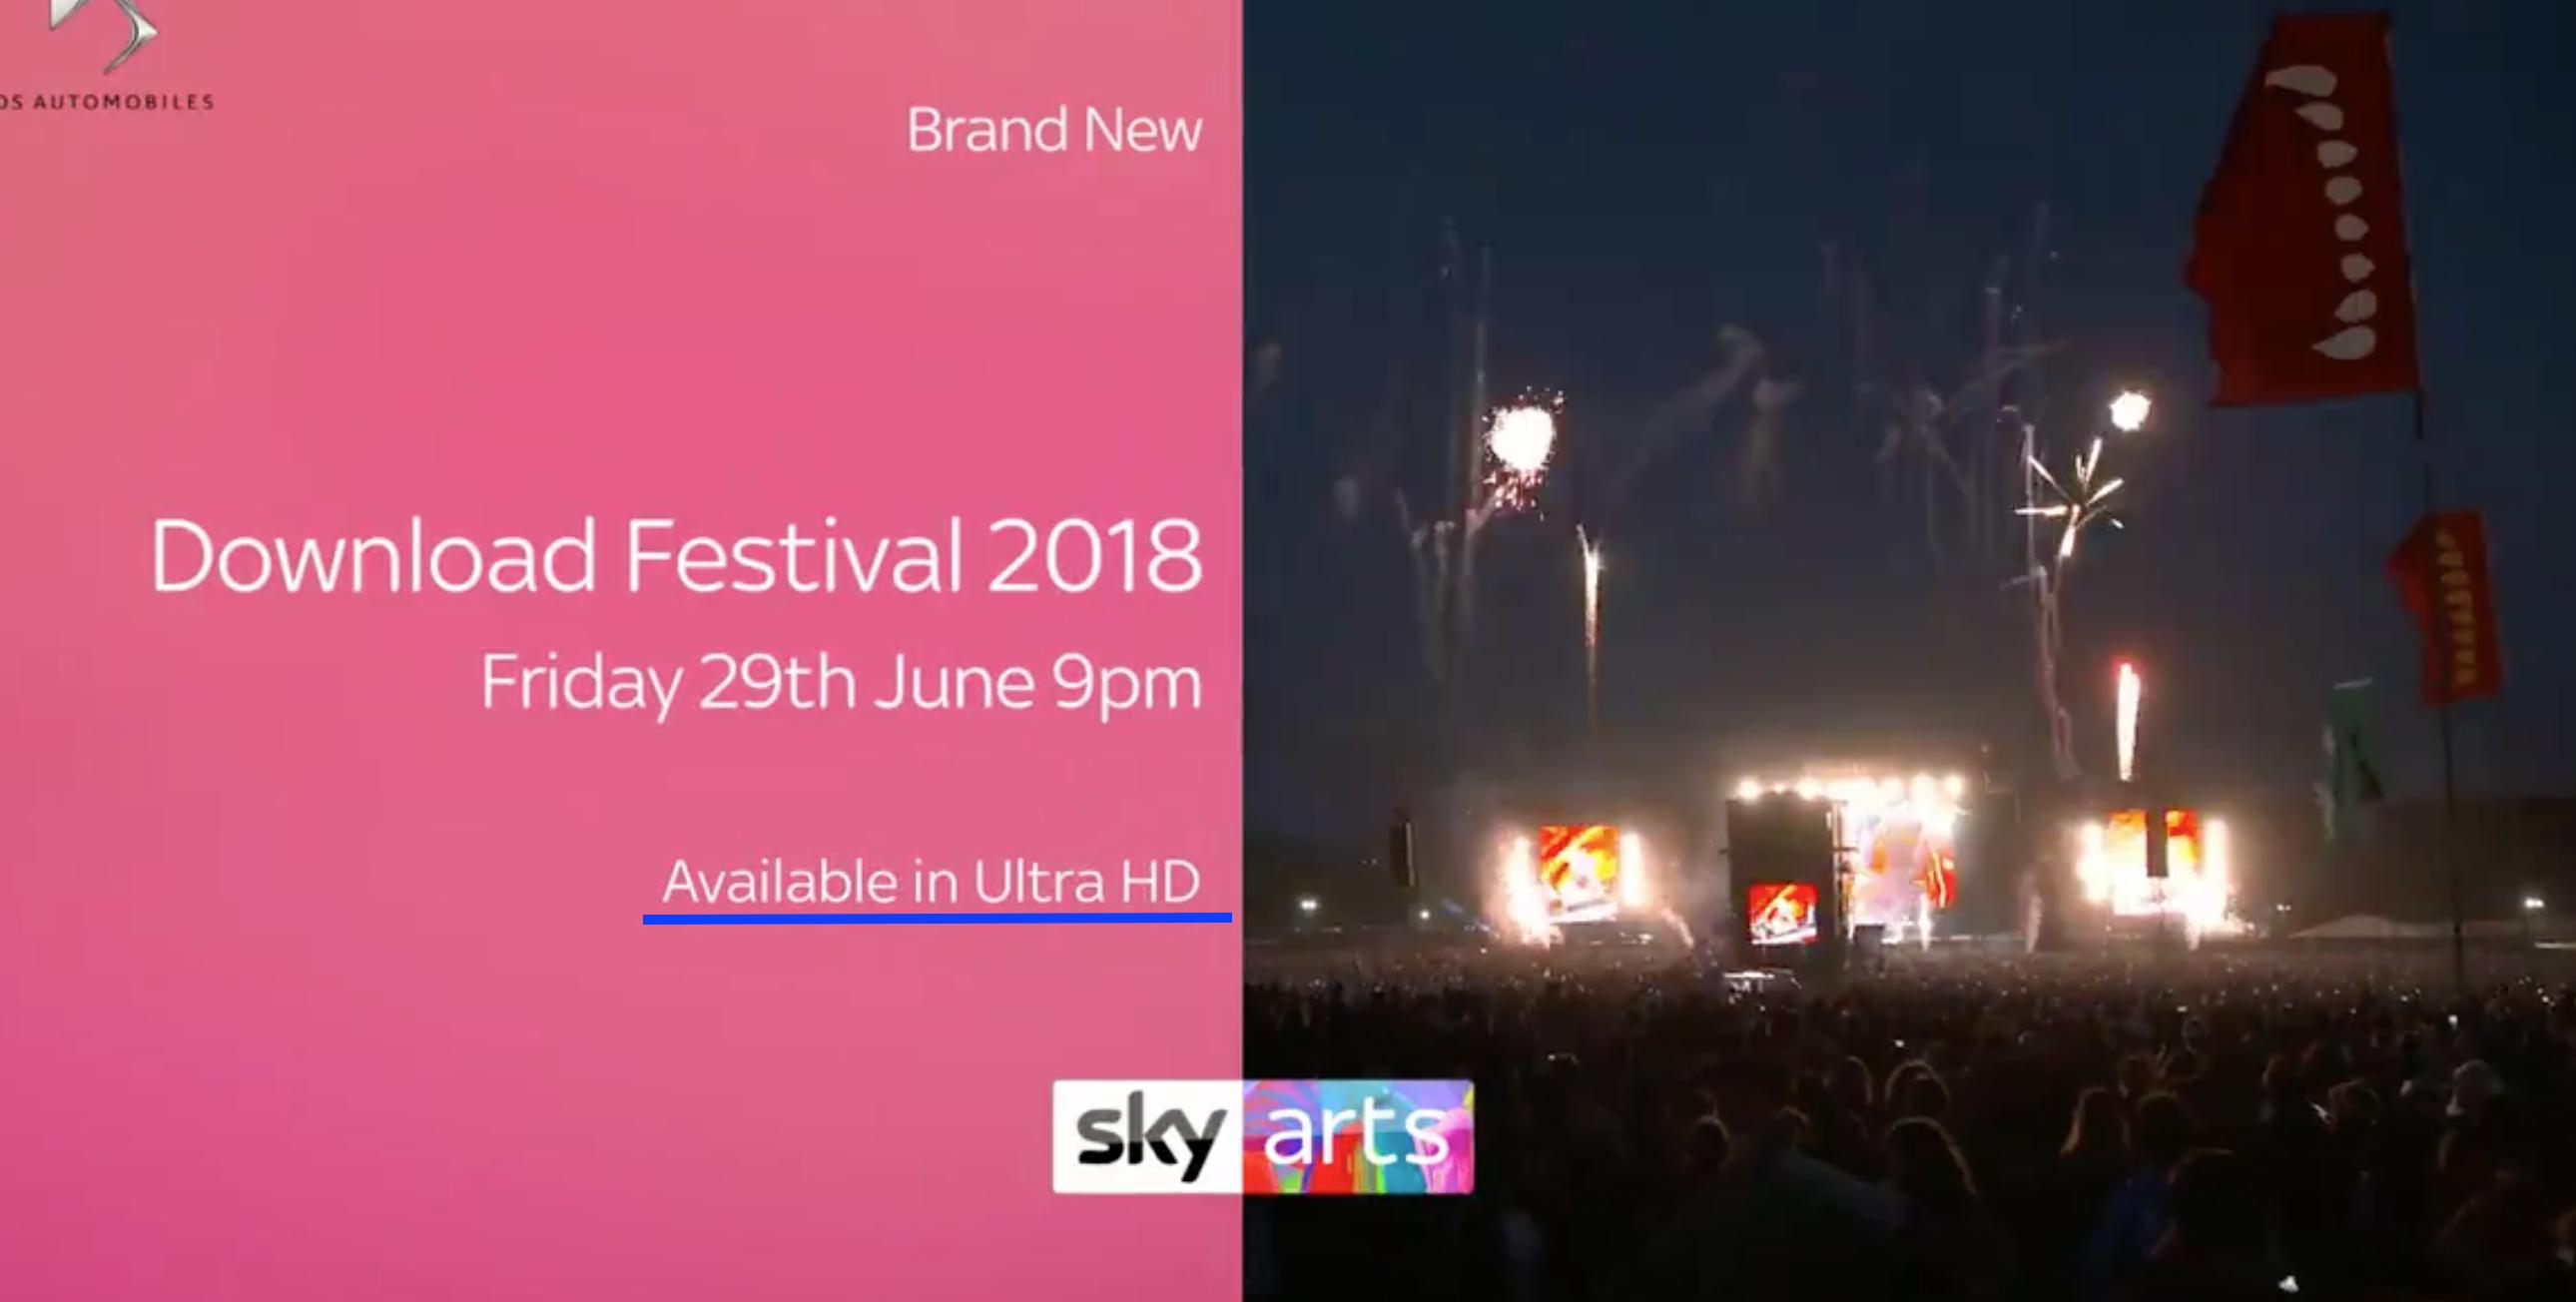 BABYMETAL confirmed for Download Festival's highlight